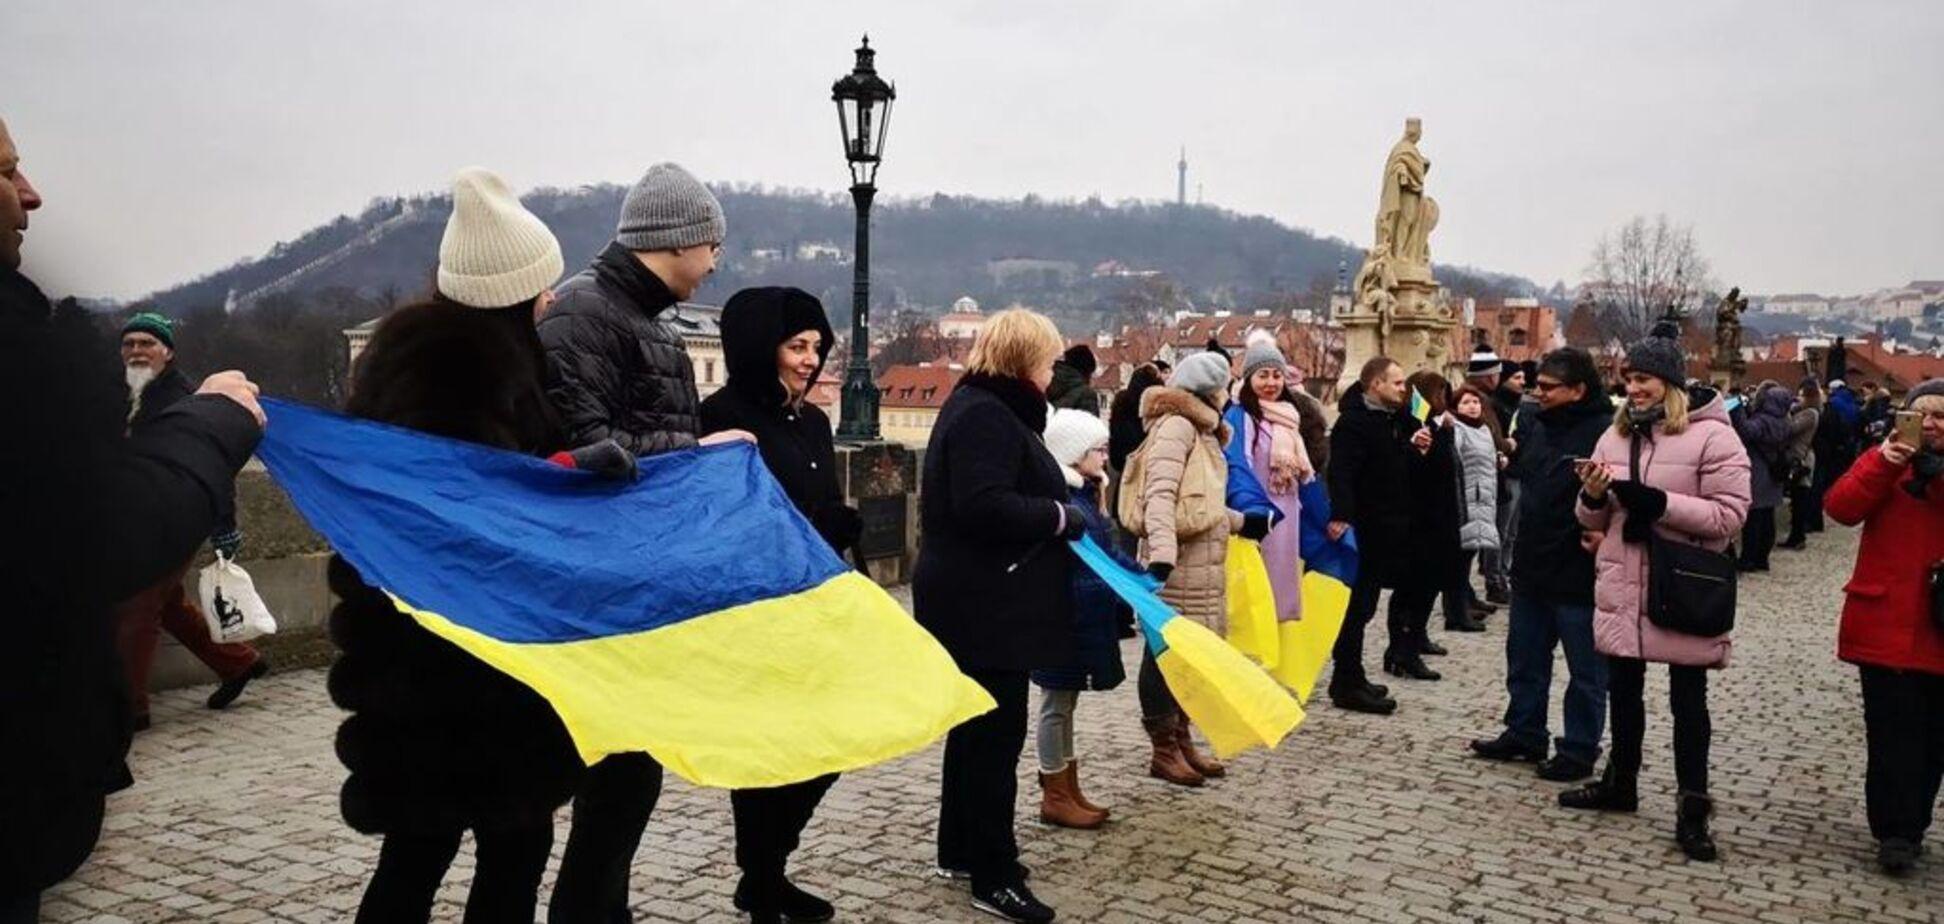 'До сих пор тяжело понять': украинцам признались, откуда взялся главный символ Дня Соборности